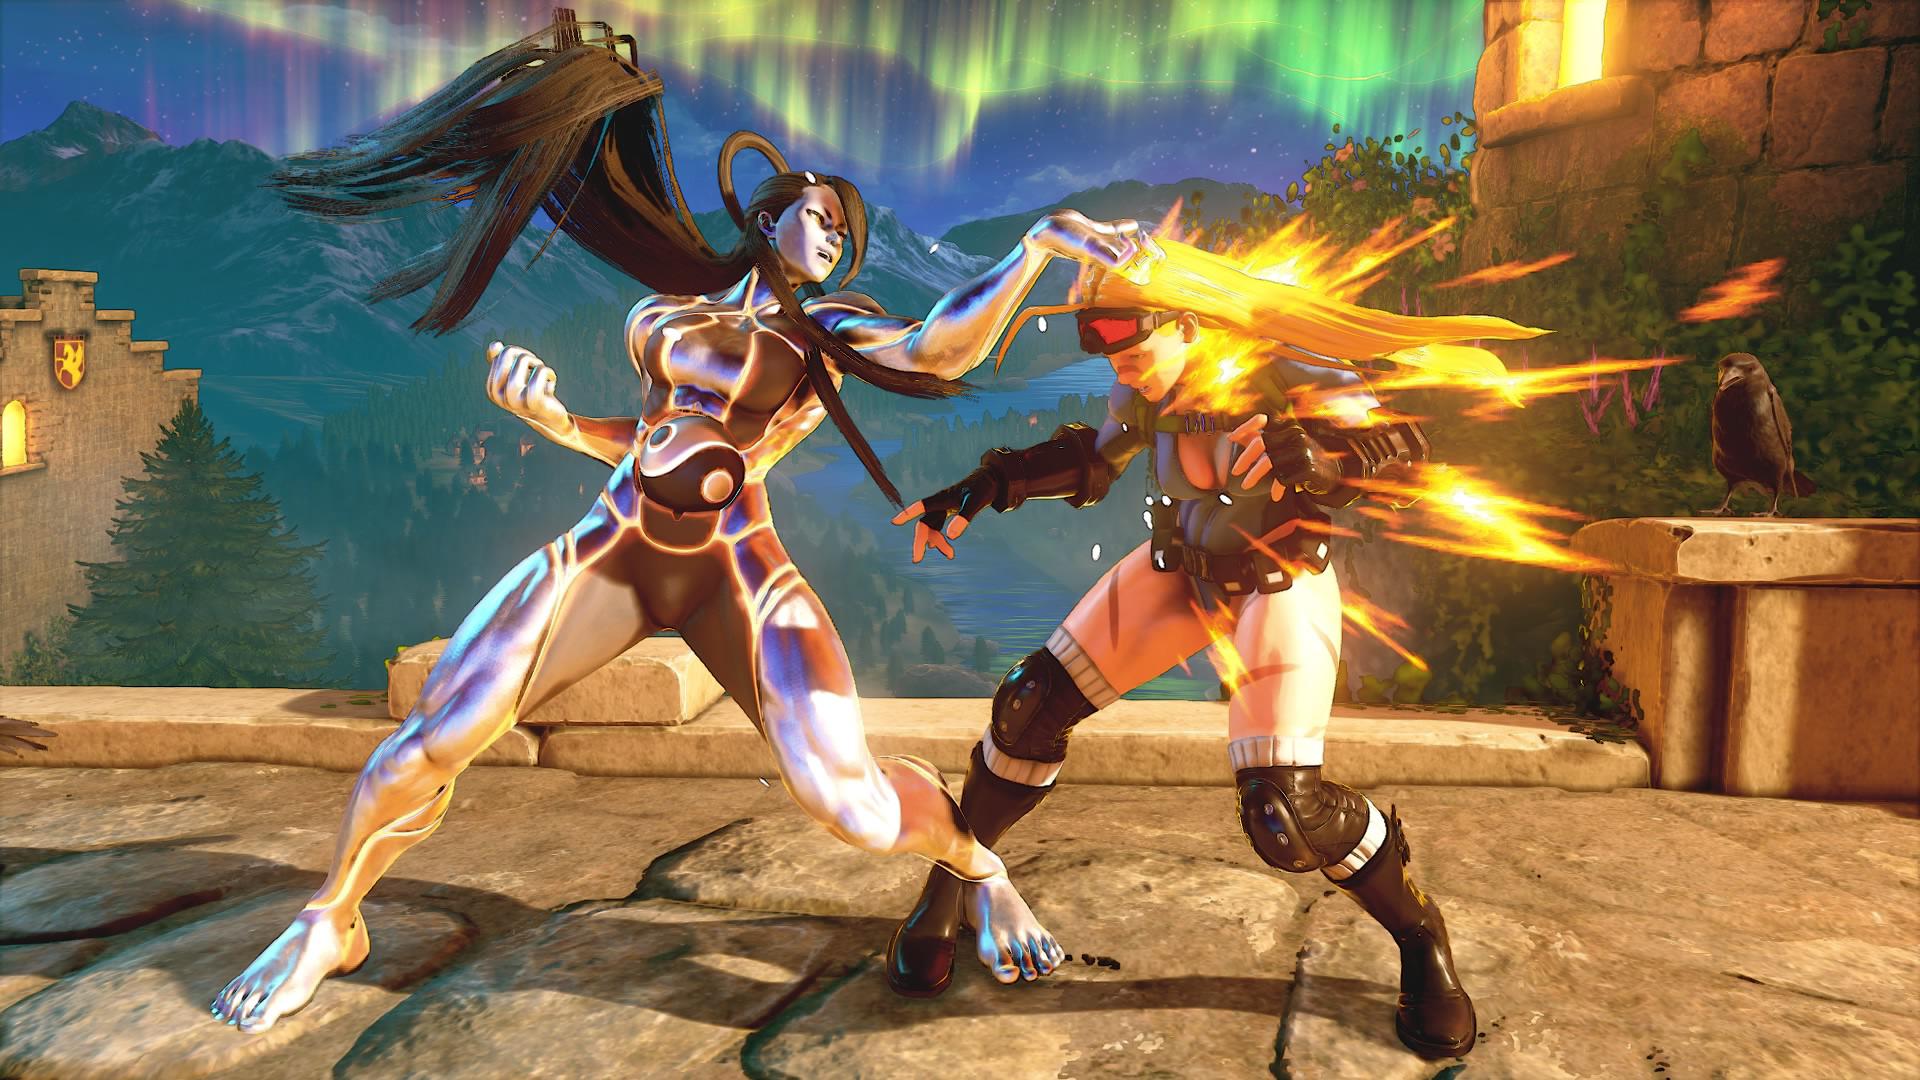 Street Fighter V: Champion Edition Seth vs Cammy